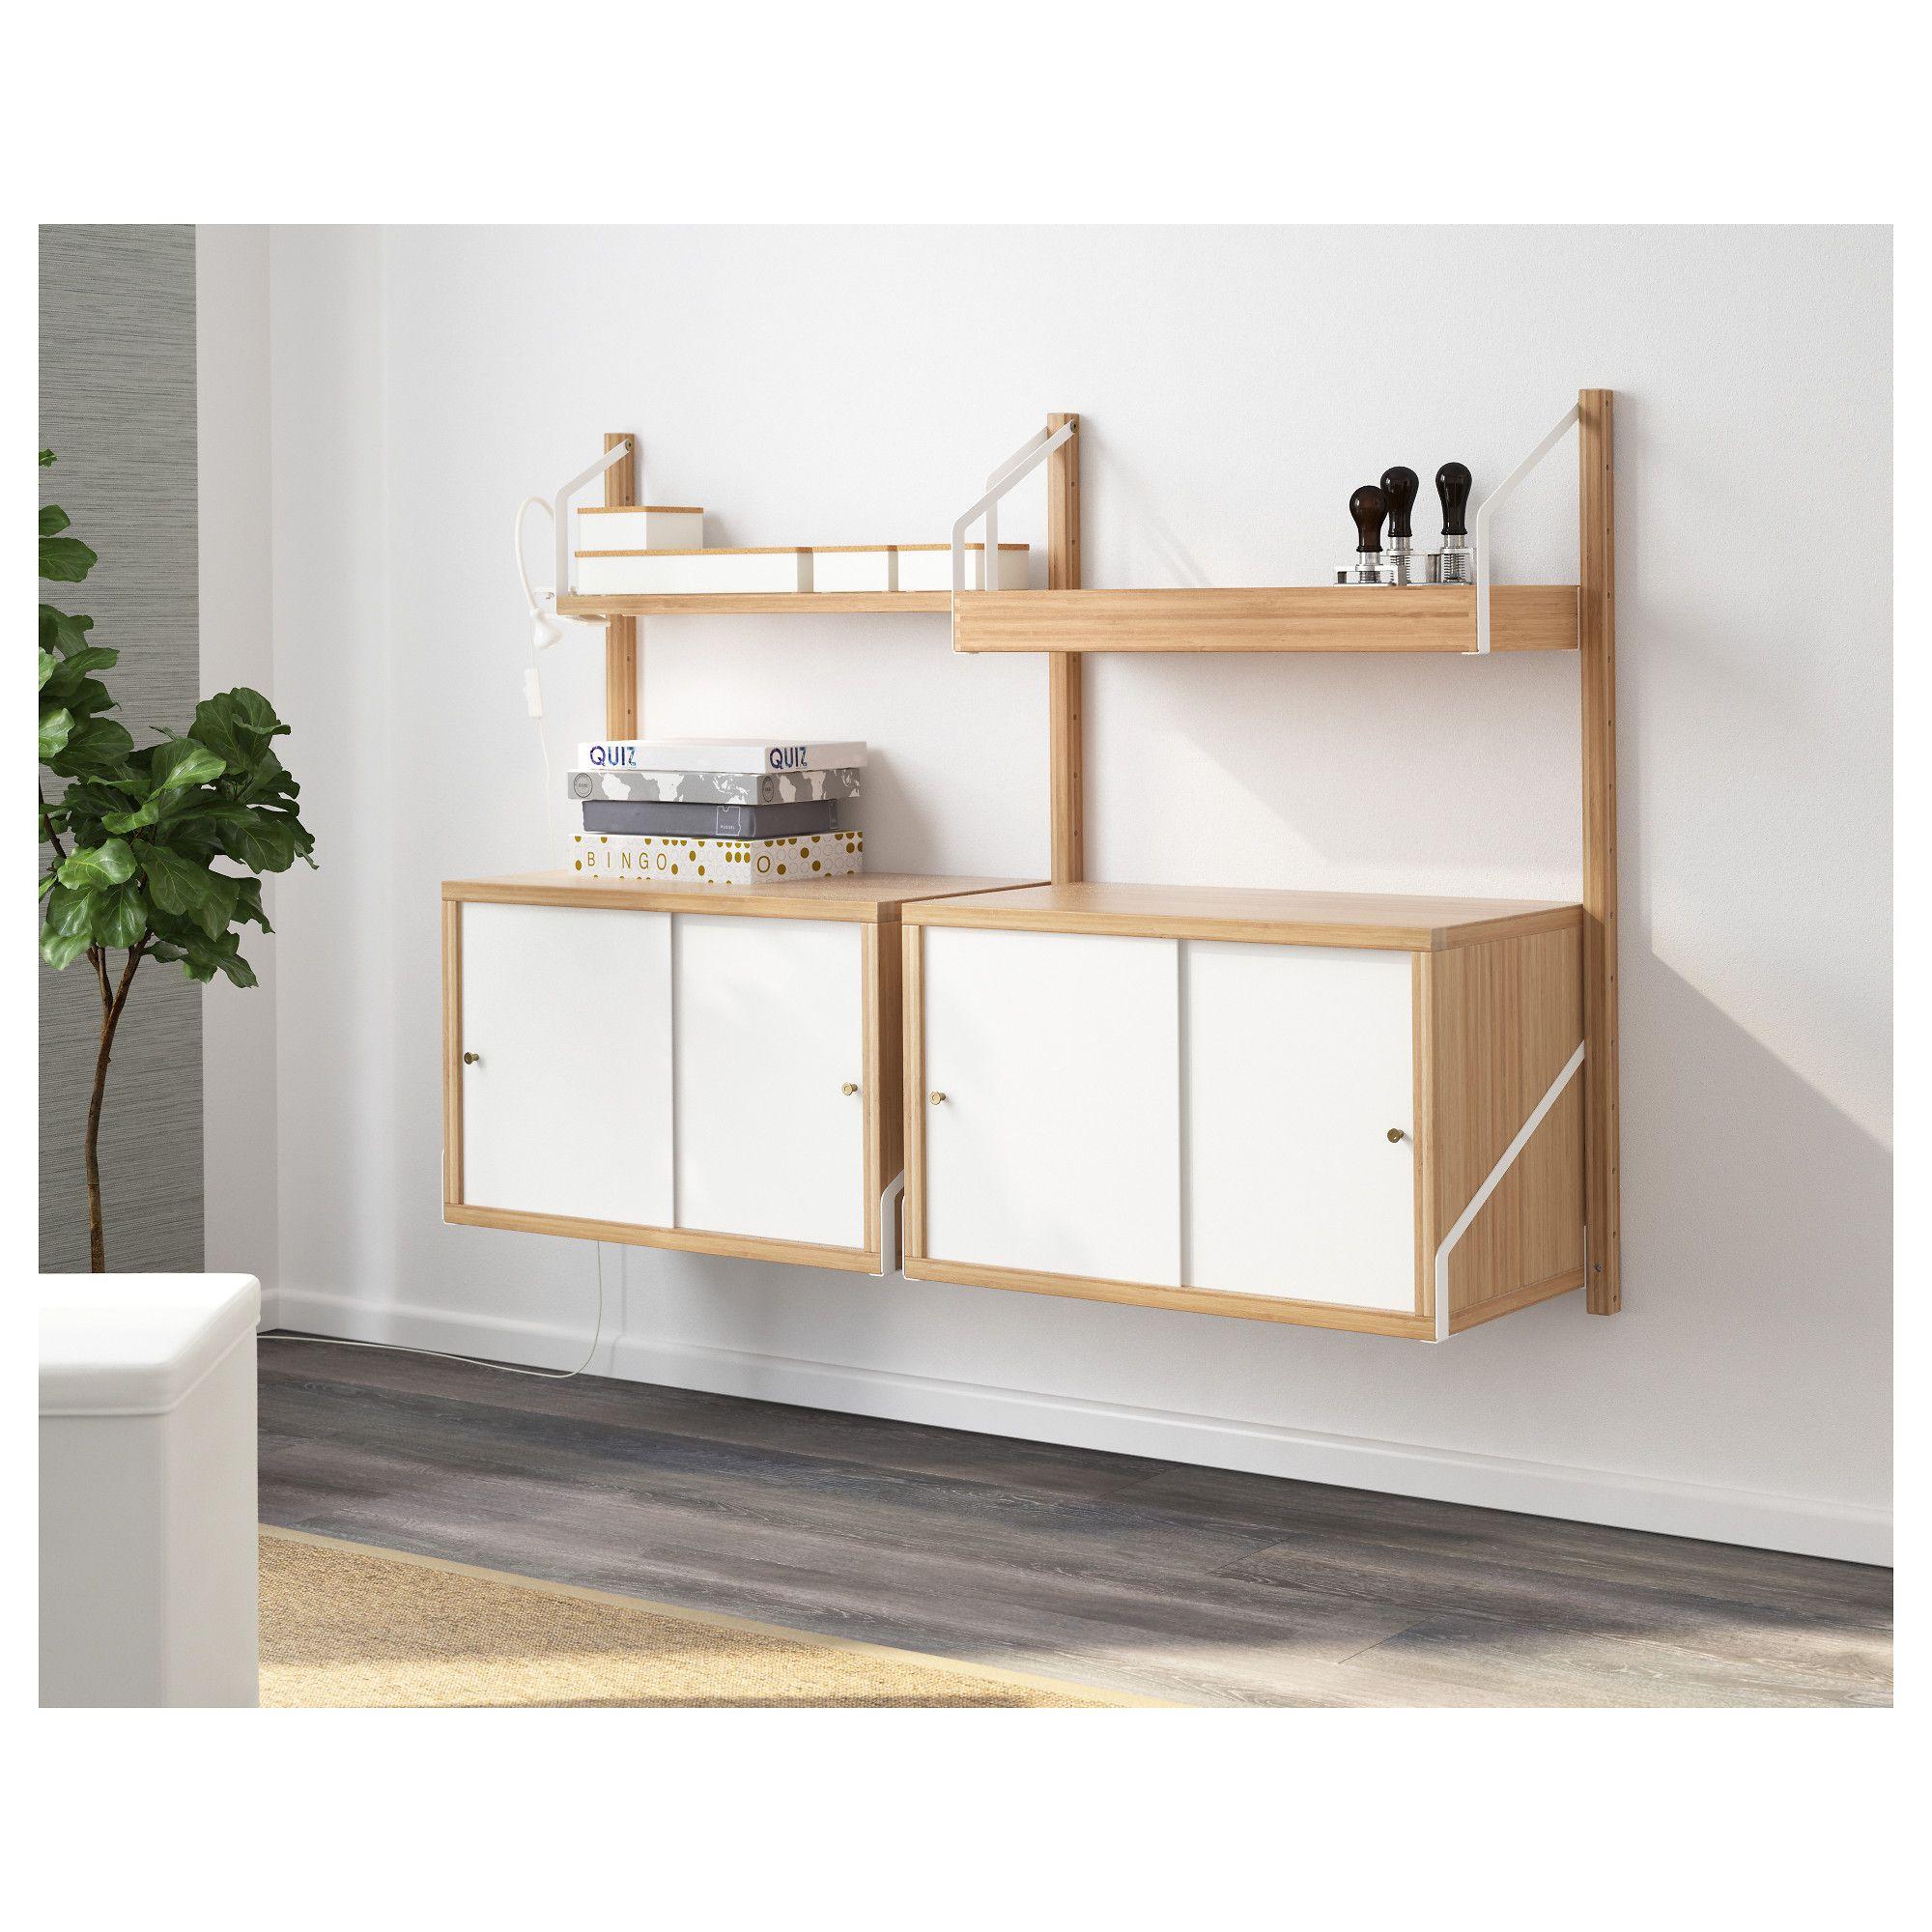 Ikea Svalnas Wall Mounted Storage Combination Bamboo White